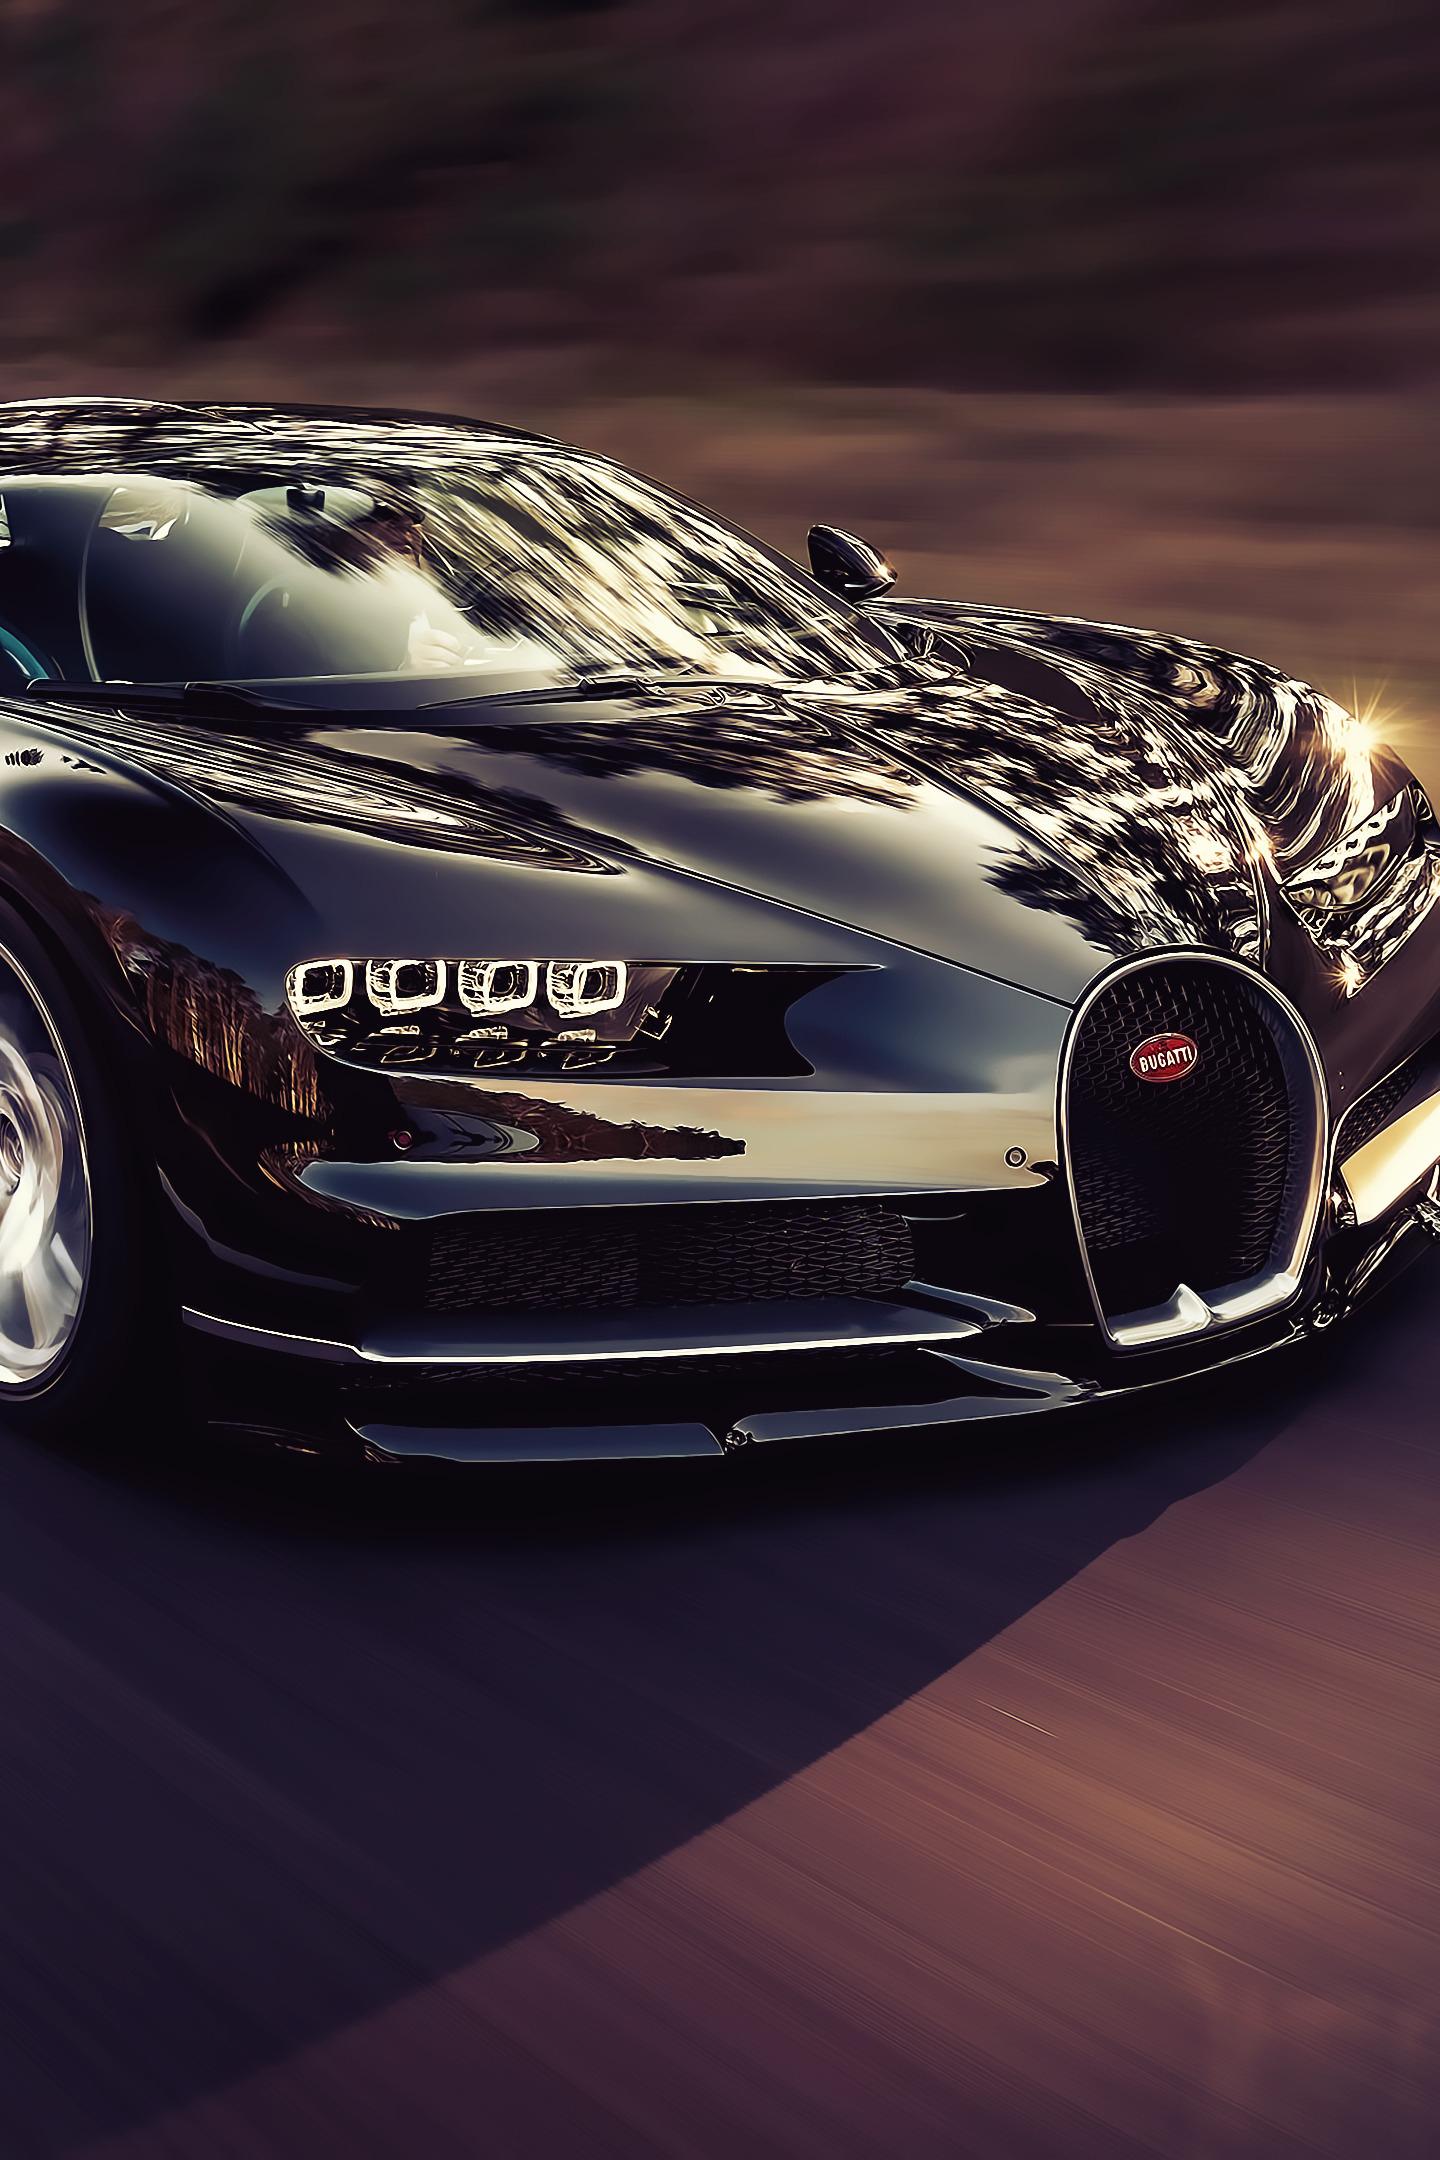 Download 1440x2560 Wallpaper Luxury Car Bugatti Chiron On